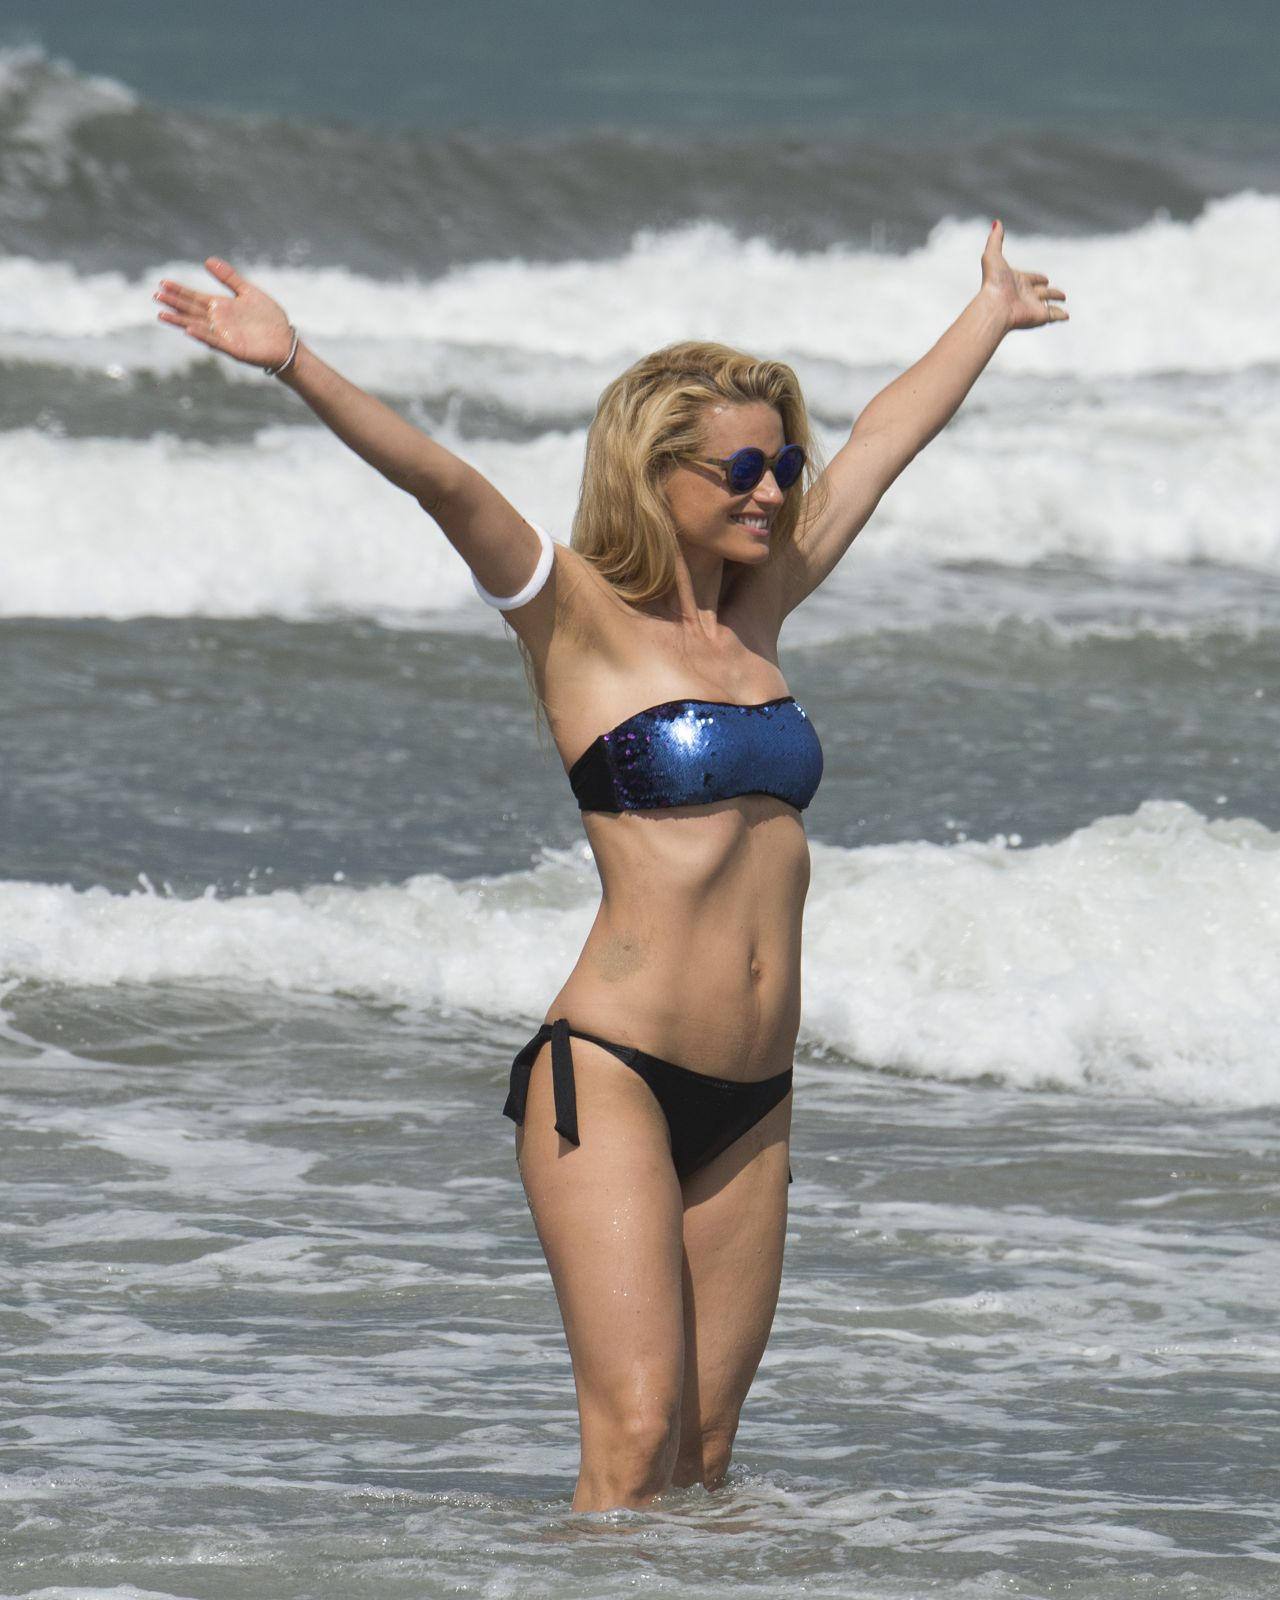 Michelle Hunziker in a Bikini – Beach in Italy, June 2015